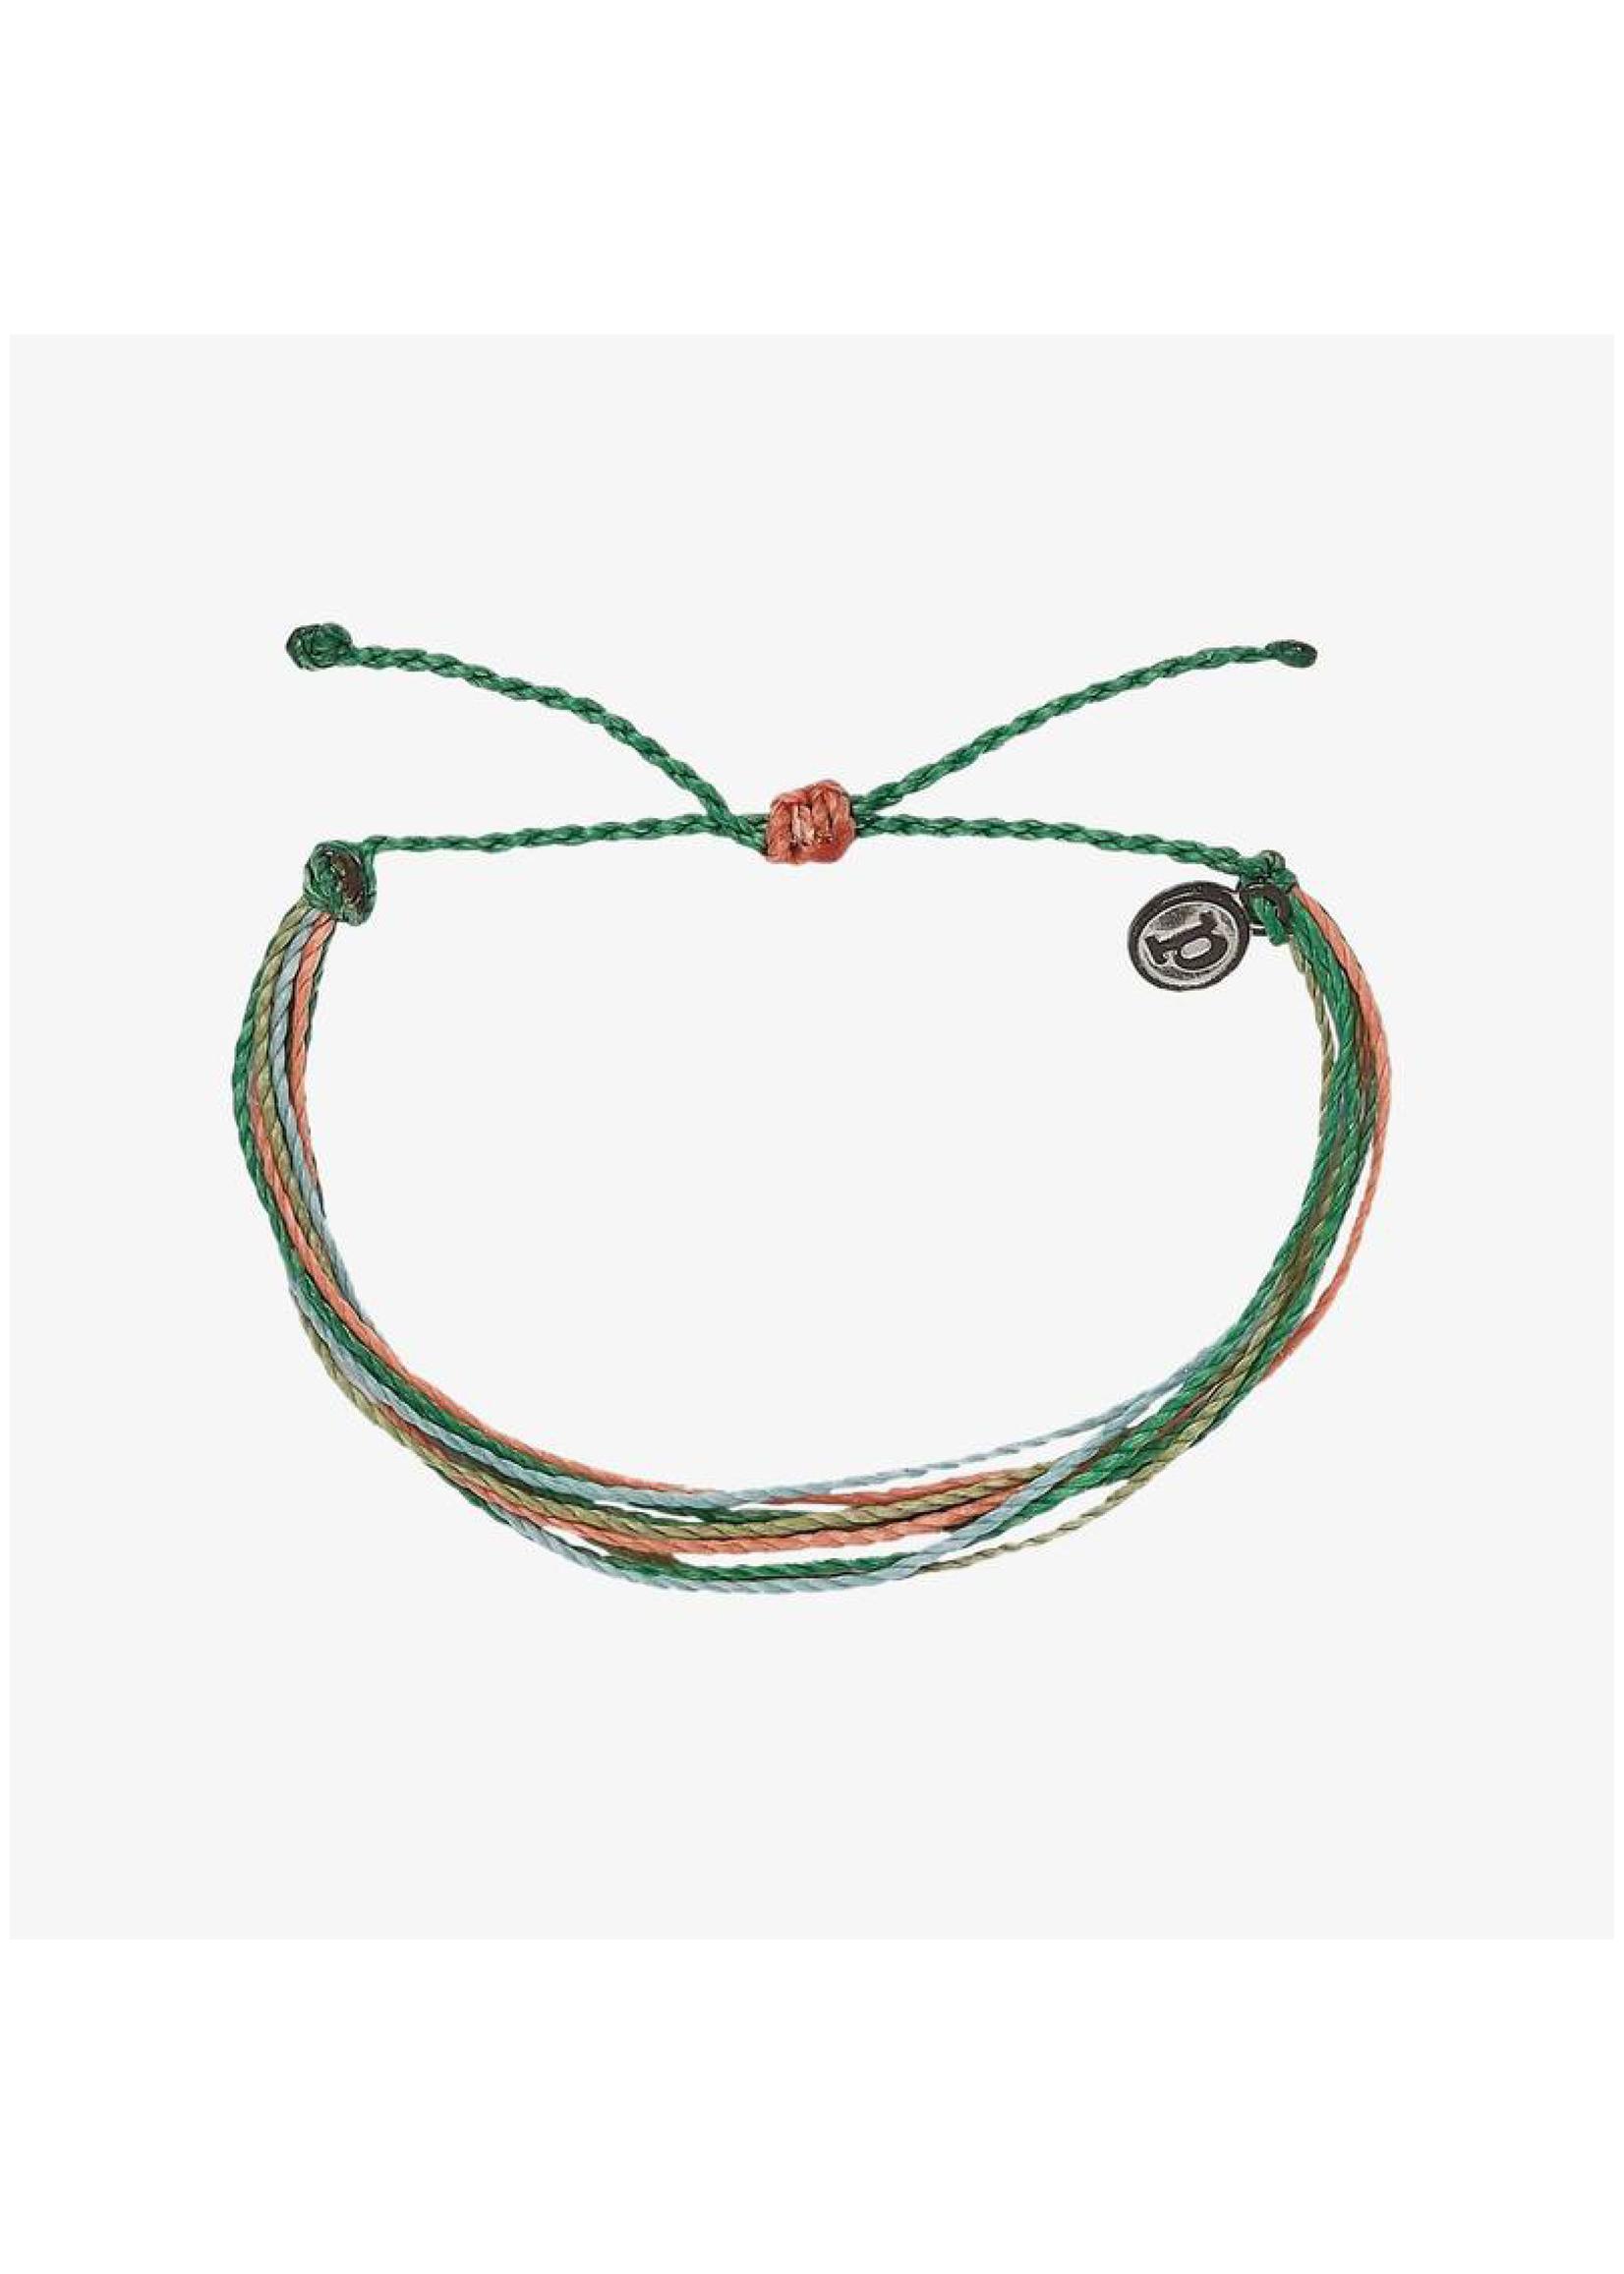 puravida bracelets Protect Our Parks Charity